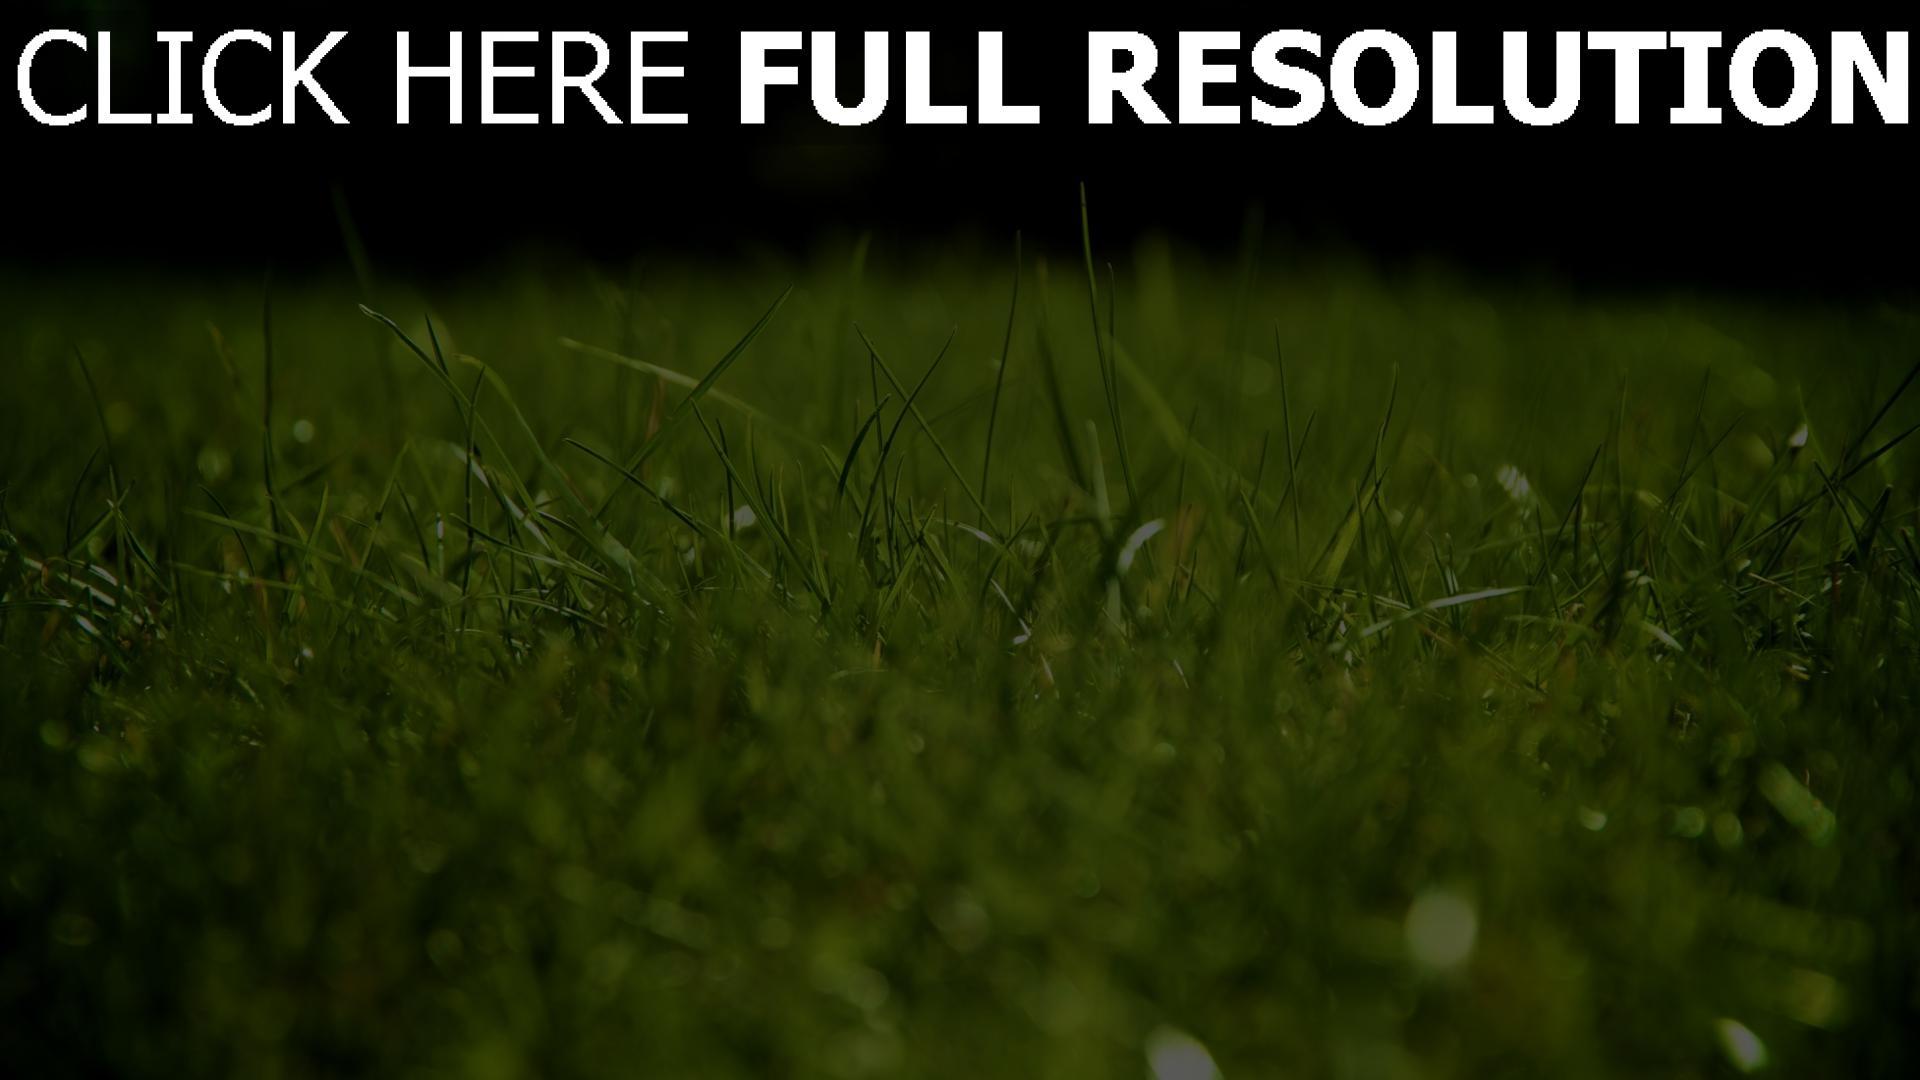 fond d'écran 1920x1080 herbe gros plan arrière-plan flou